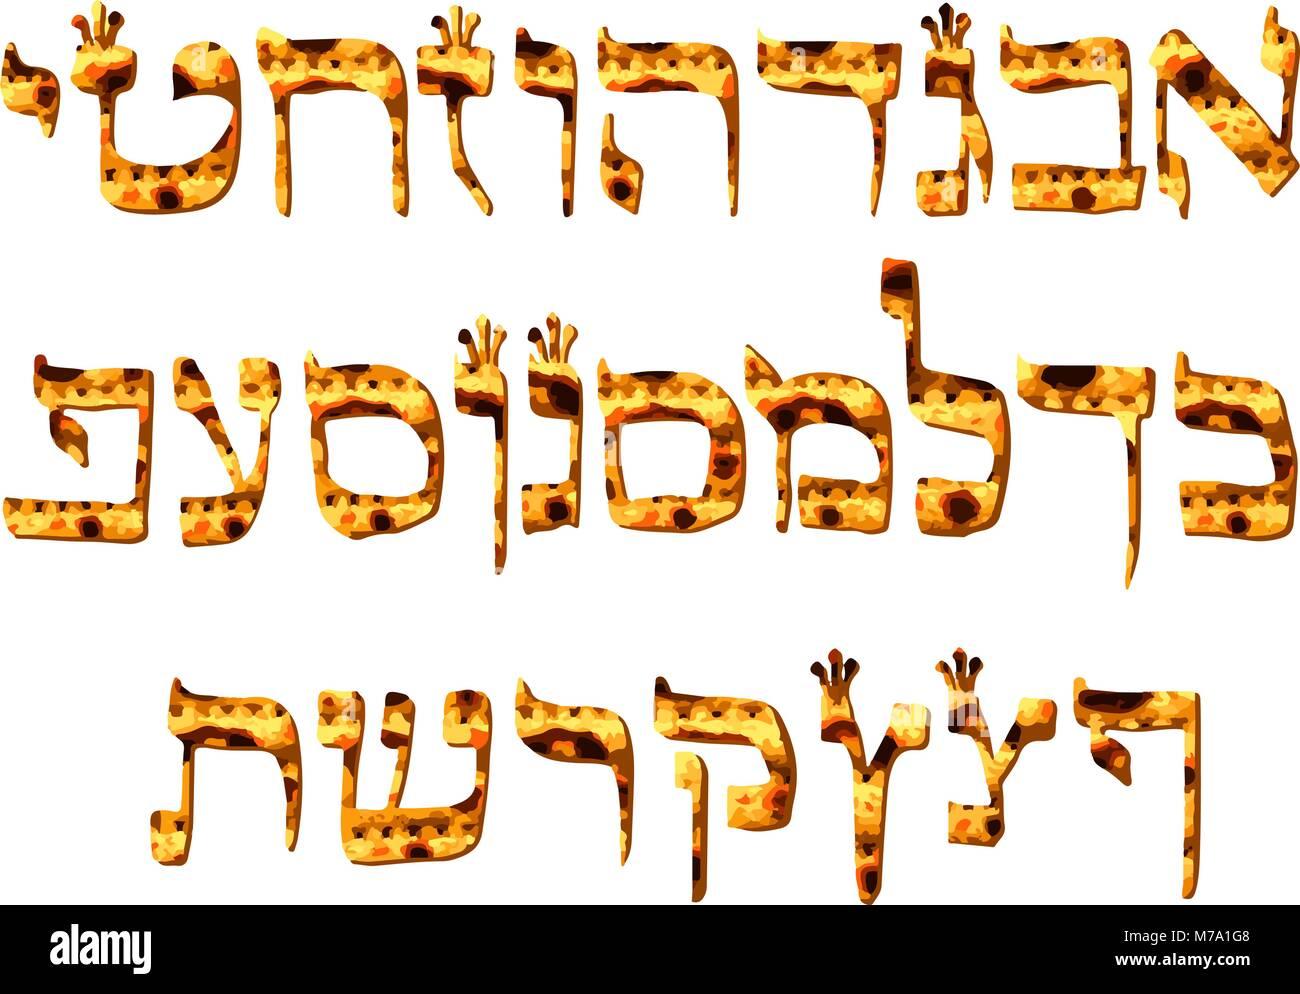 Alphabet Hebrew Passover matzah. Hebrew letter Pesach. Calligraphy font. Jewish Easter. Texture matzo. Vector illustration - Stock Vector